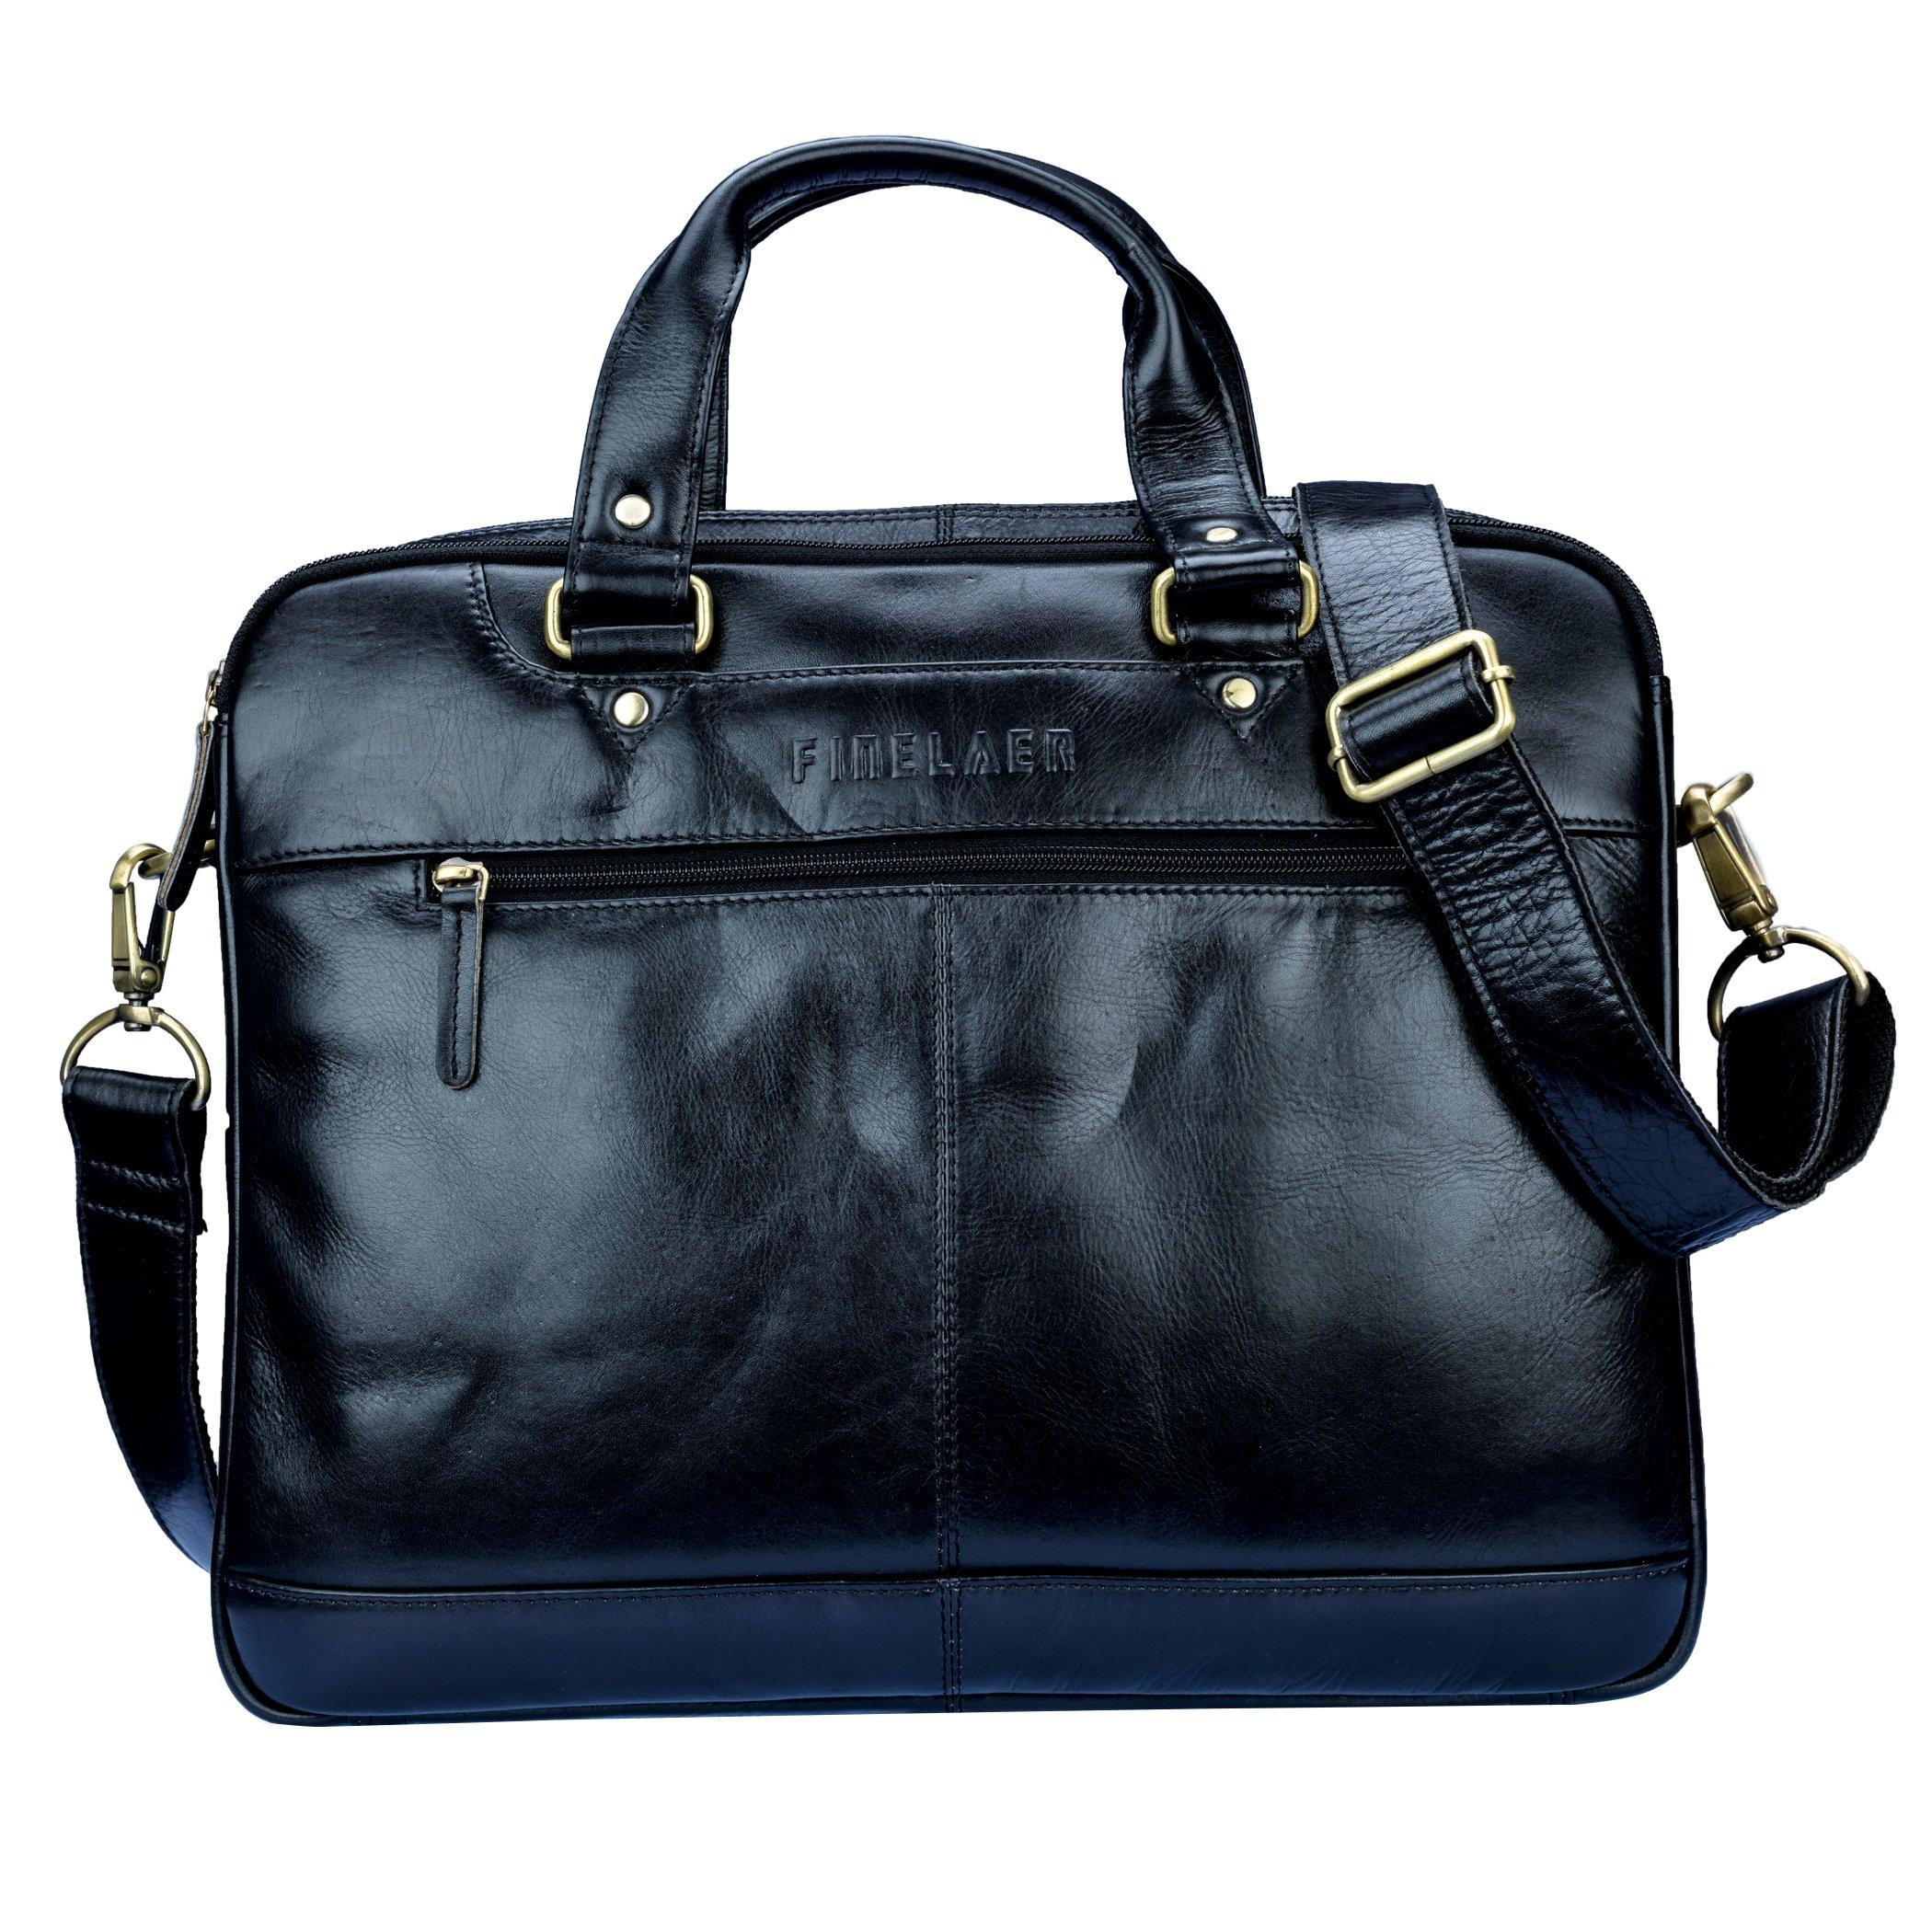 Finelaer Leather Laptop Computer Messenger Zipper Bag Black with Trolley Sleeve for Men Women